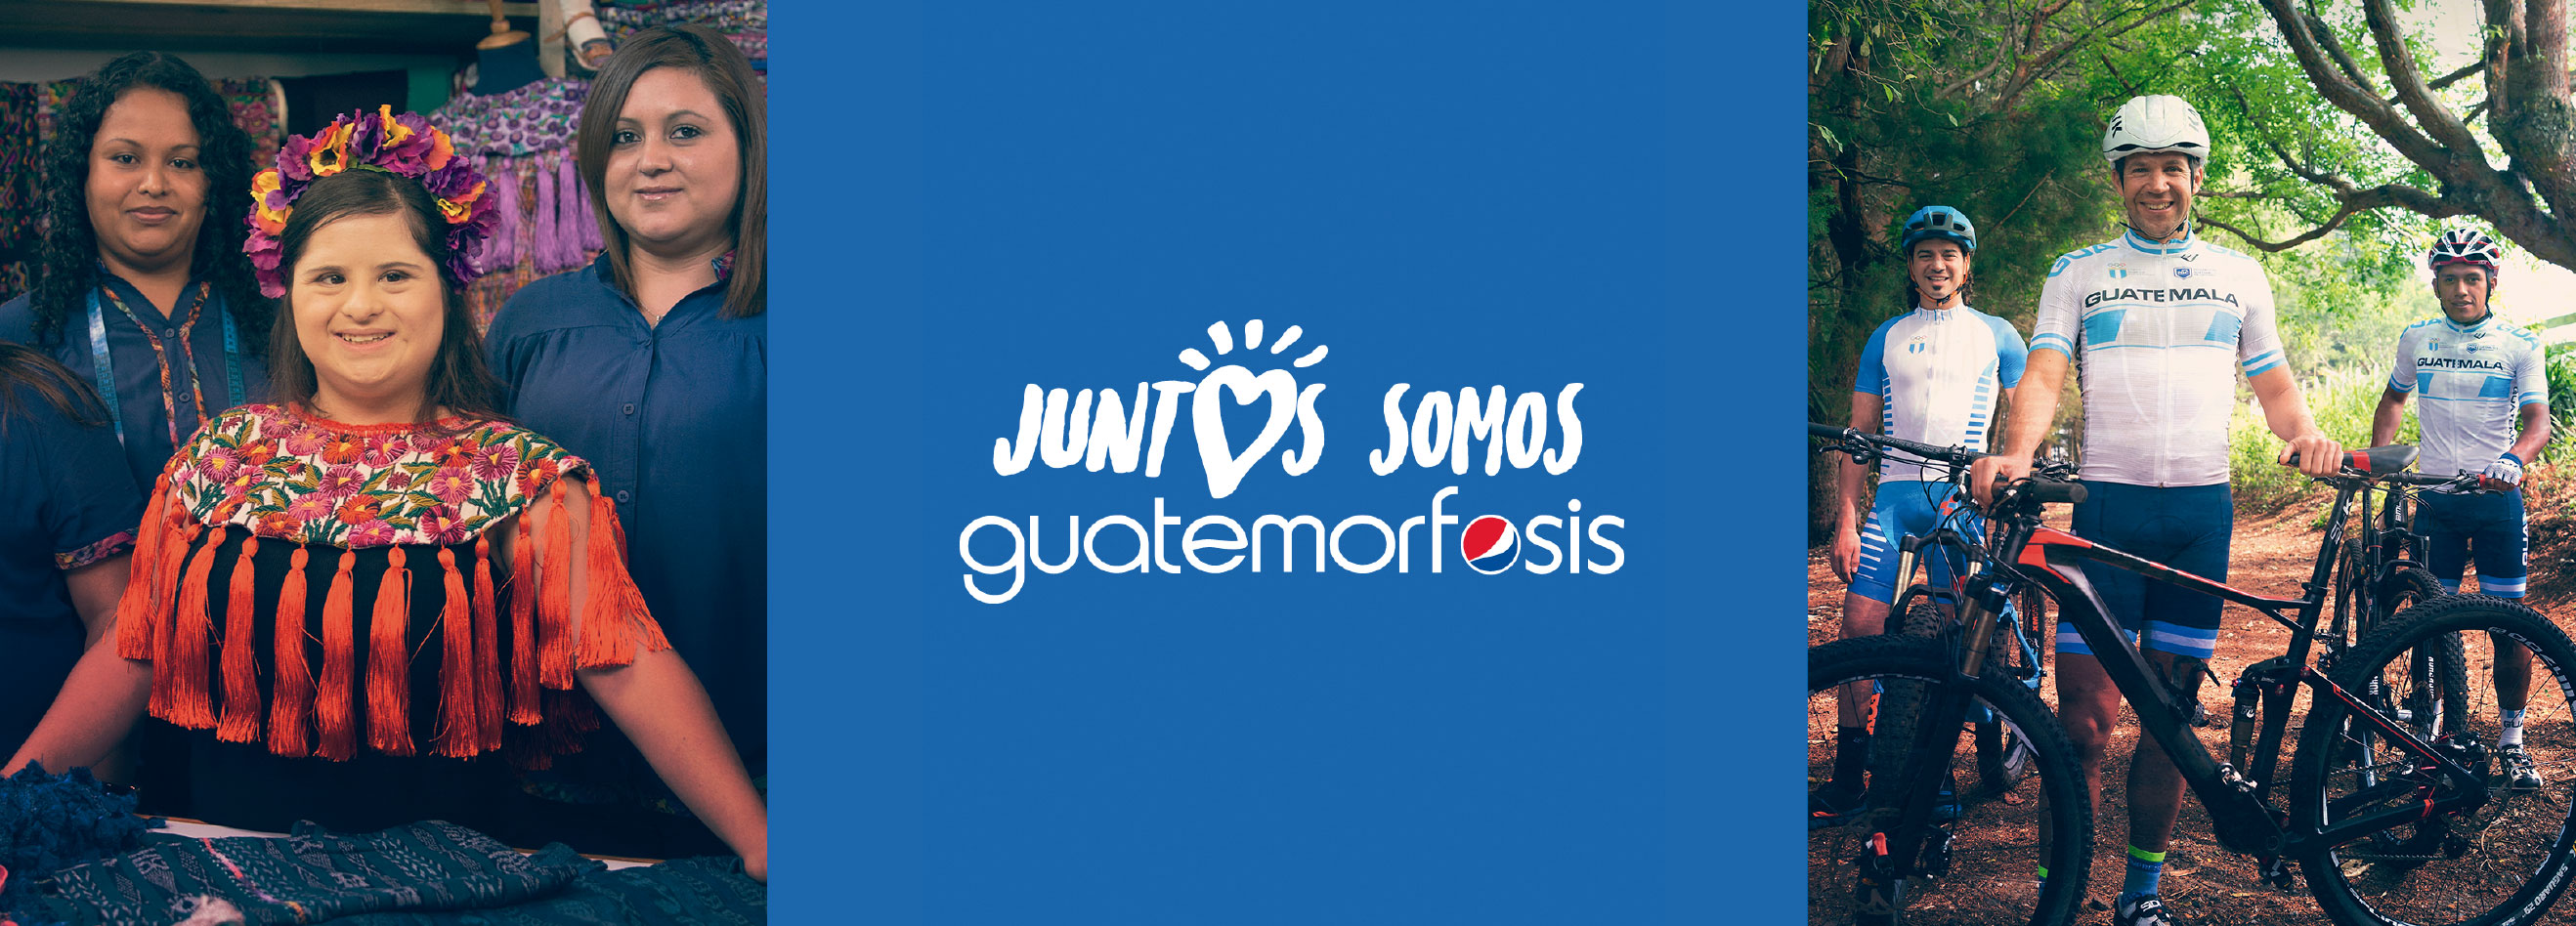 #yosoy guatemorfosis